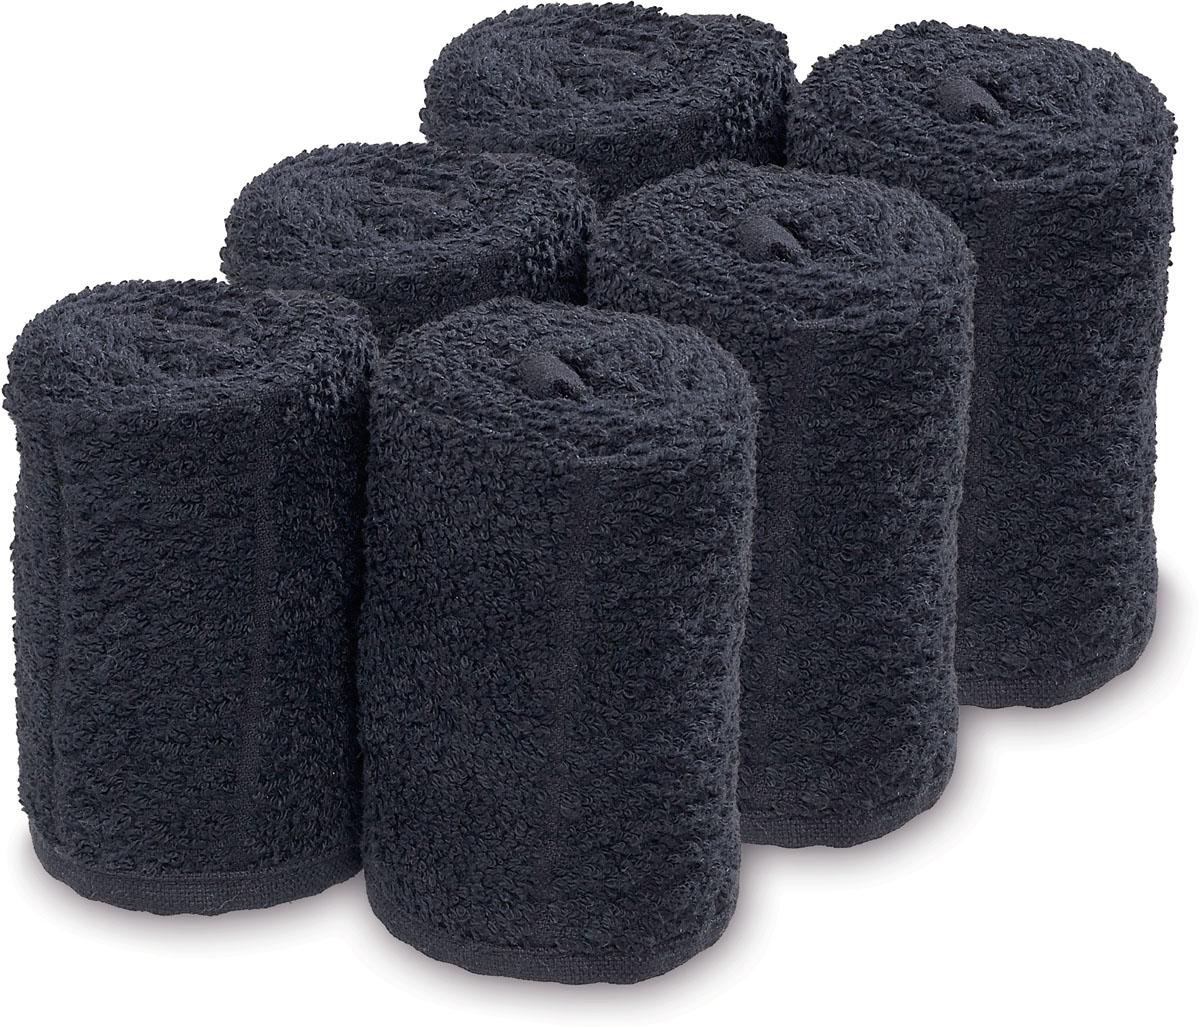 Barburys Take Care Handtücher-Gesichtstücher 6 Stk / Schwarz SN-3500262